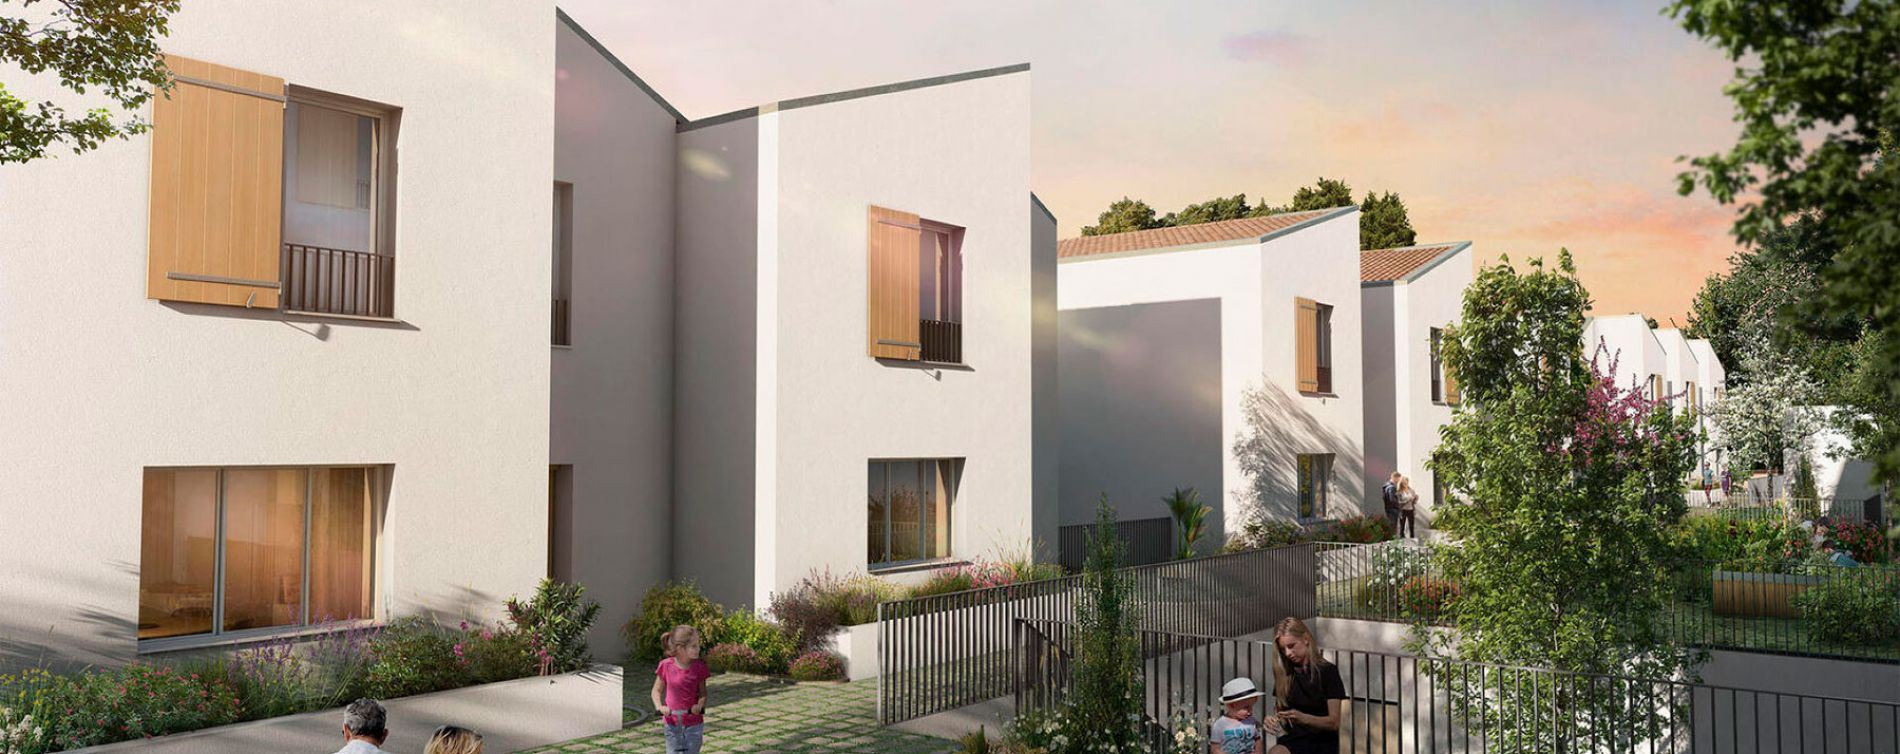 Ondres : programme immobilier neuve « Programme immobilier n°217512 » (3)